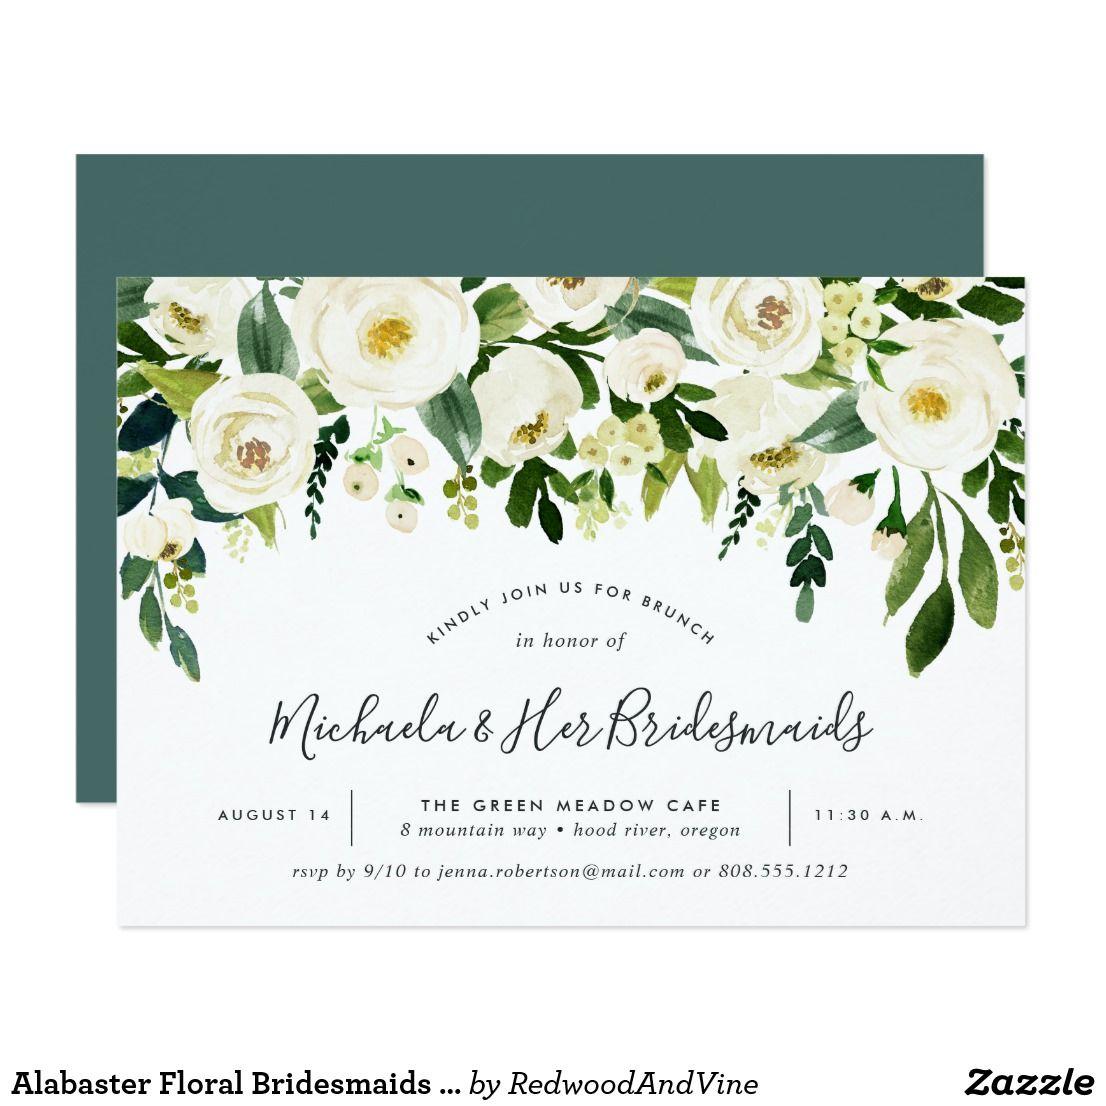 alabaster floral bridesmaids brunch invitation in 2018 wedding